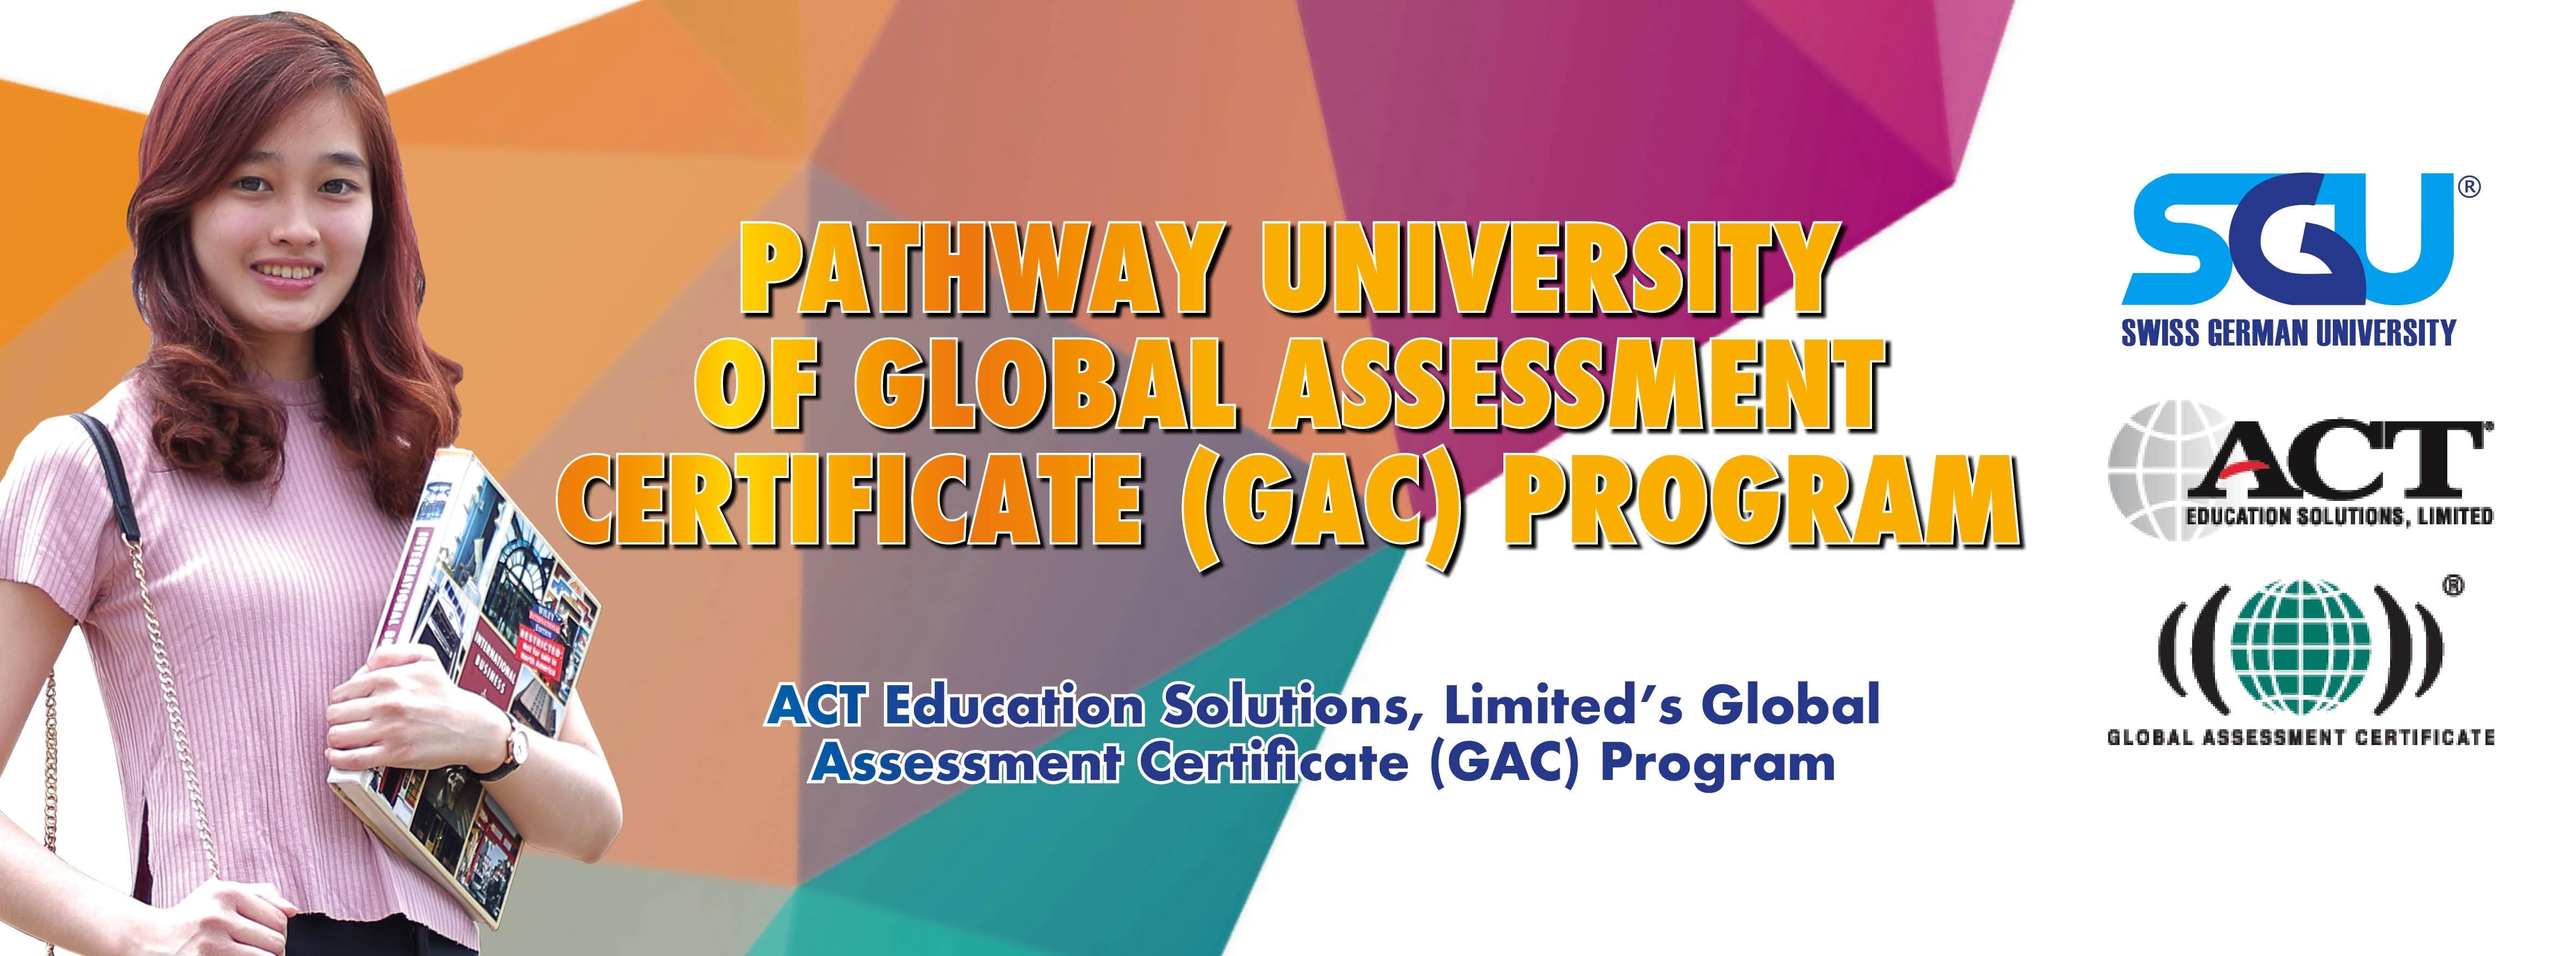 Gac Program - Swiss German University-Sgu Academic Calendar January 2020